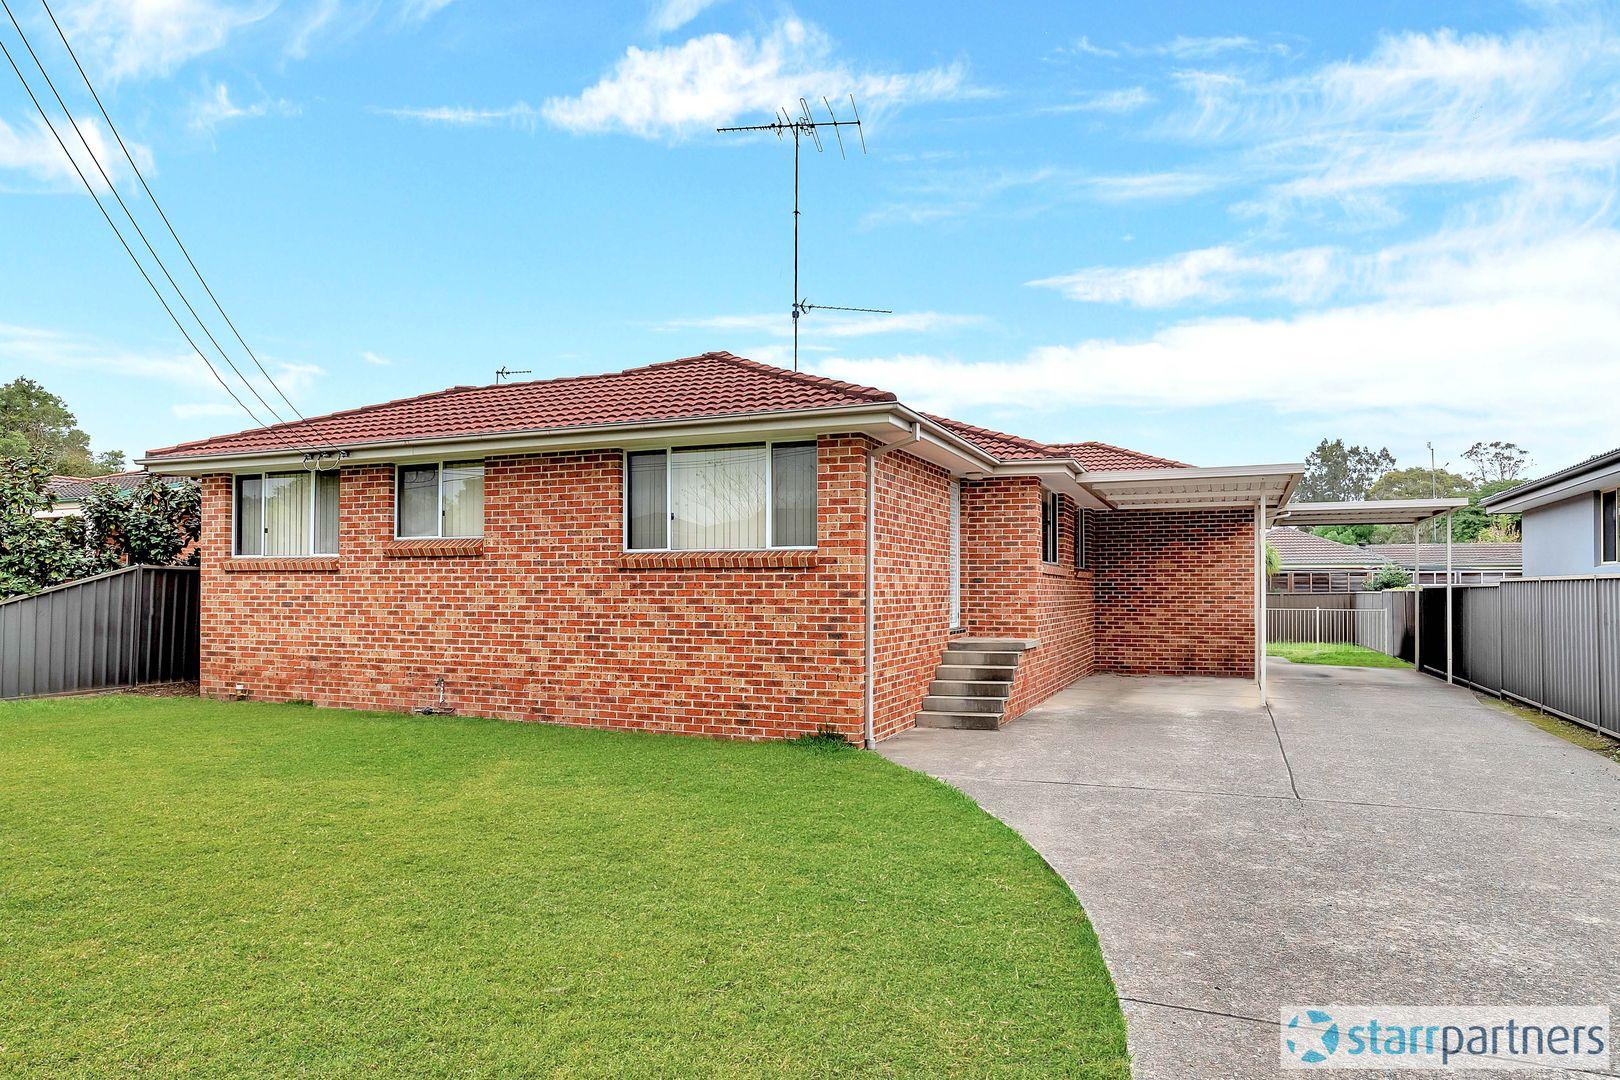 1/10 Wolseley Rd, Mcgraths Hill NSW 2756, Image 0